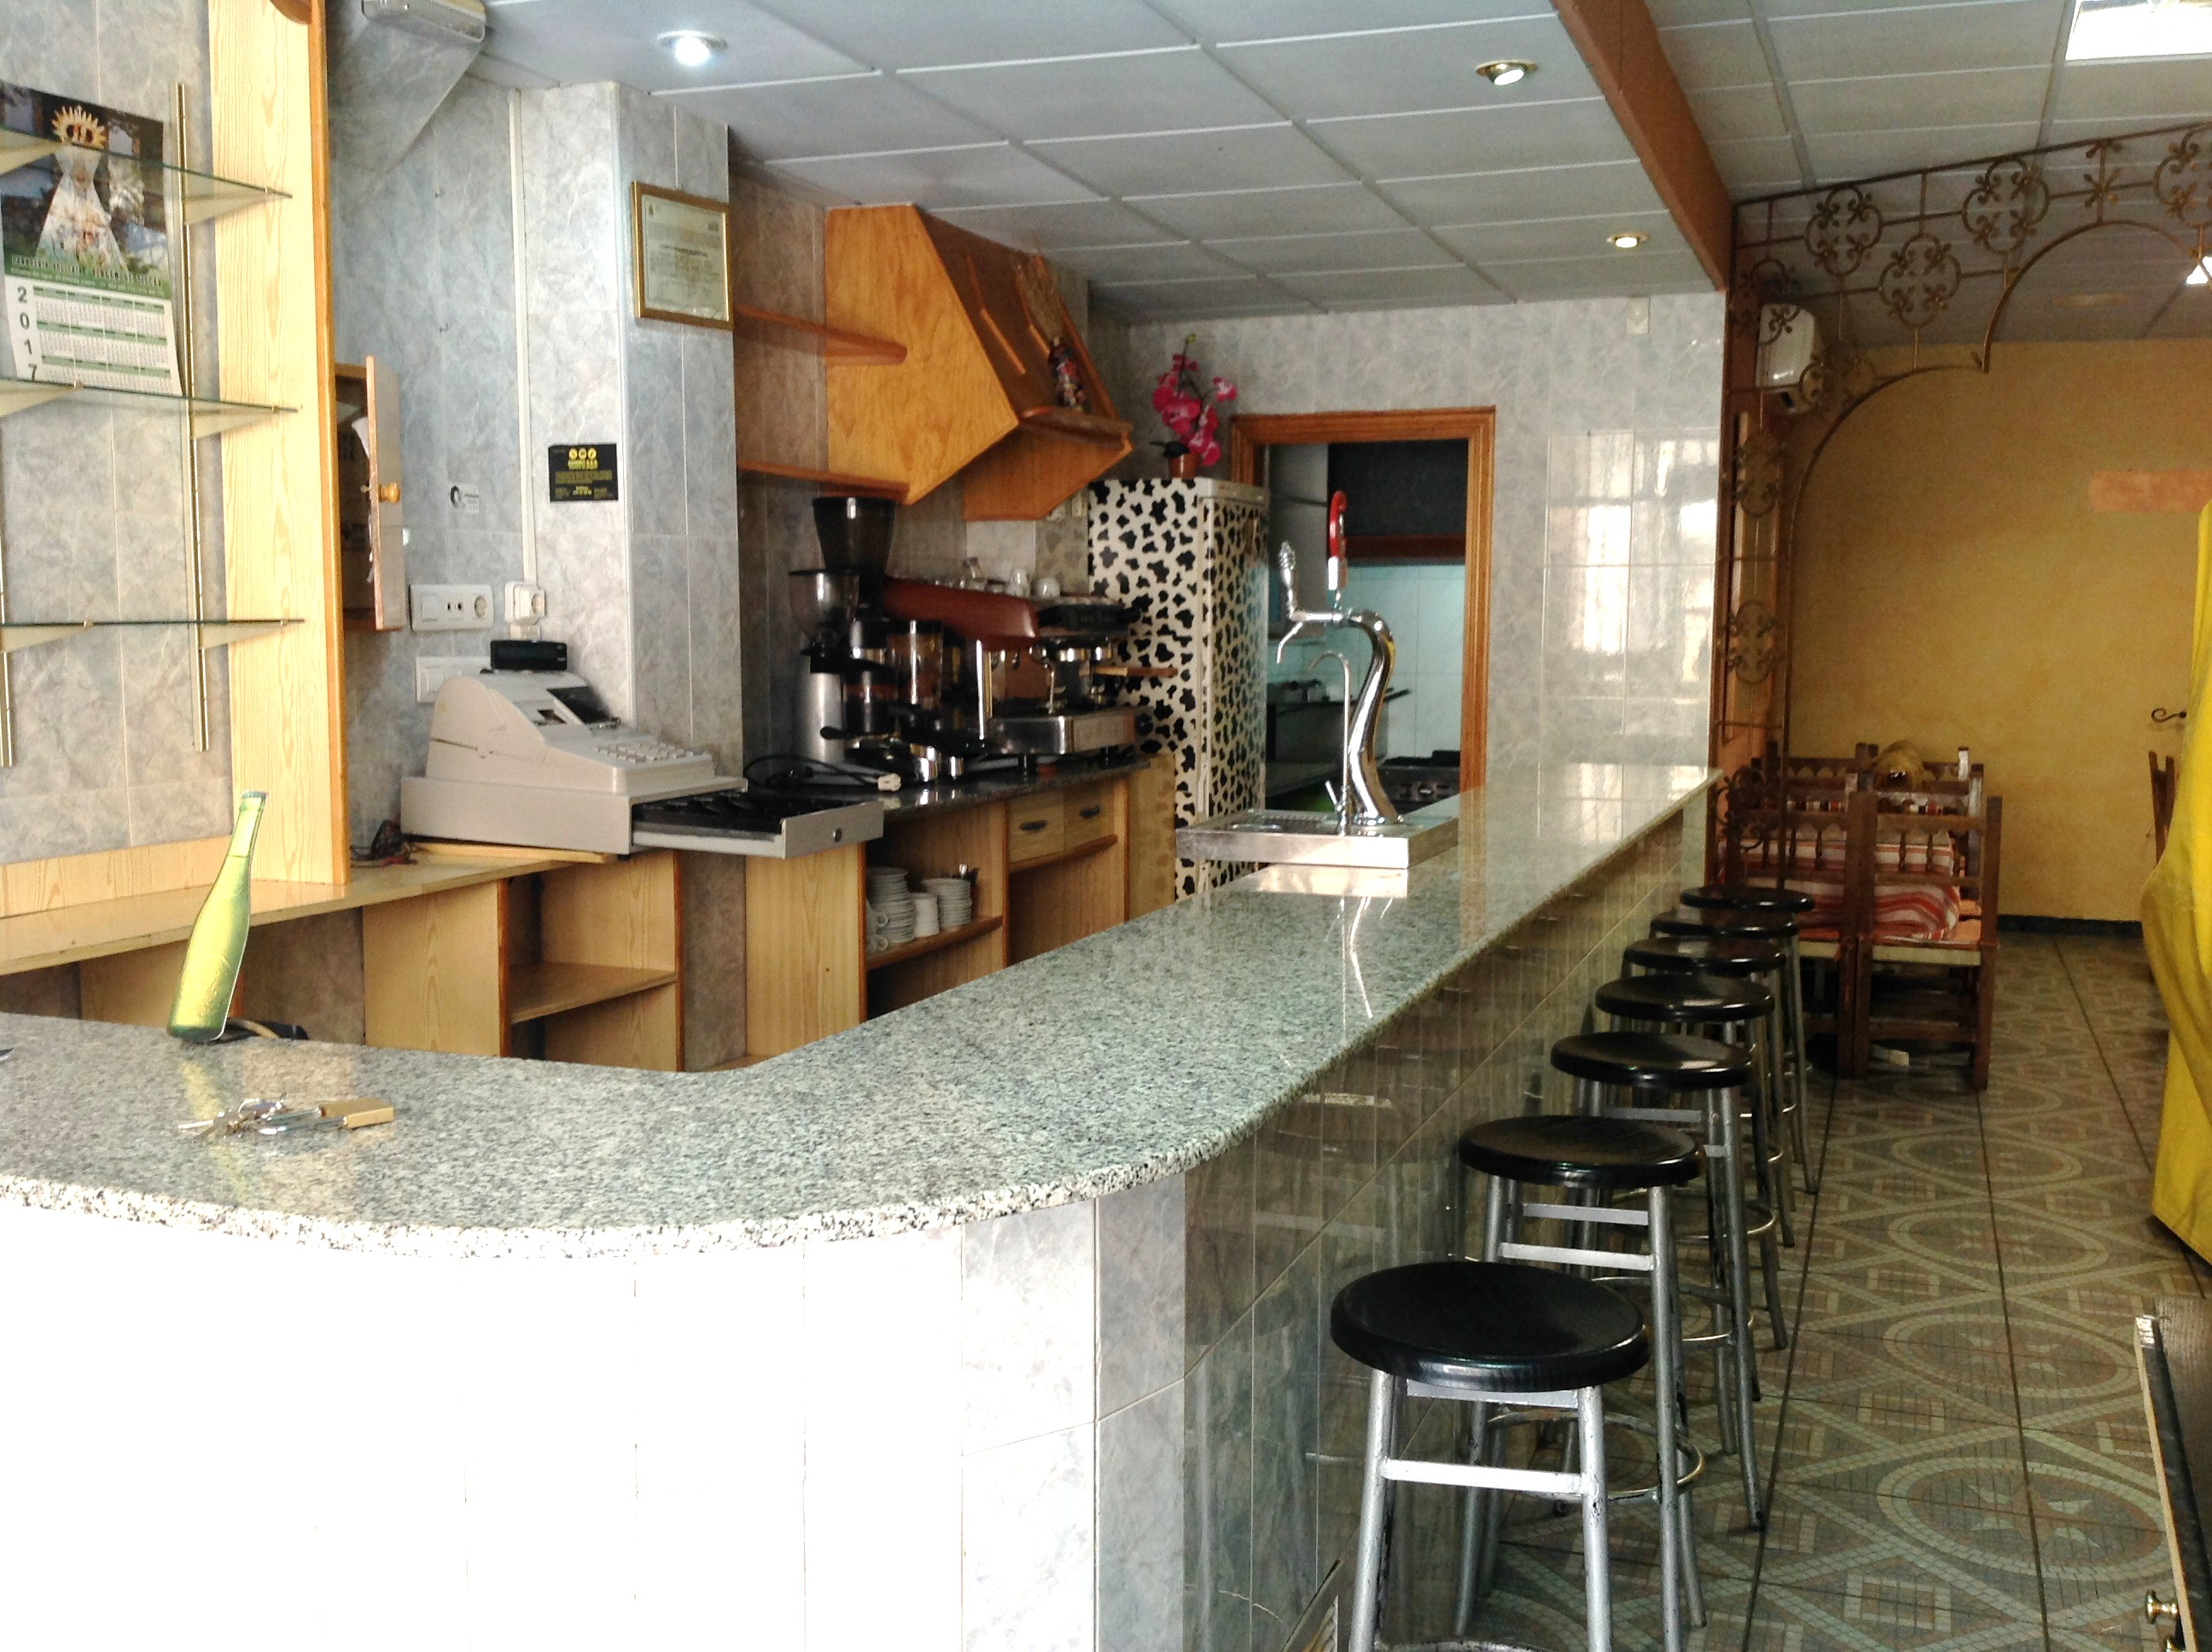 Bar En Alquiler En Pozo Alc N Ja N Montado Y Bien Situado # Muebles Pozo Ocana